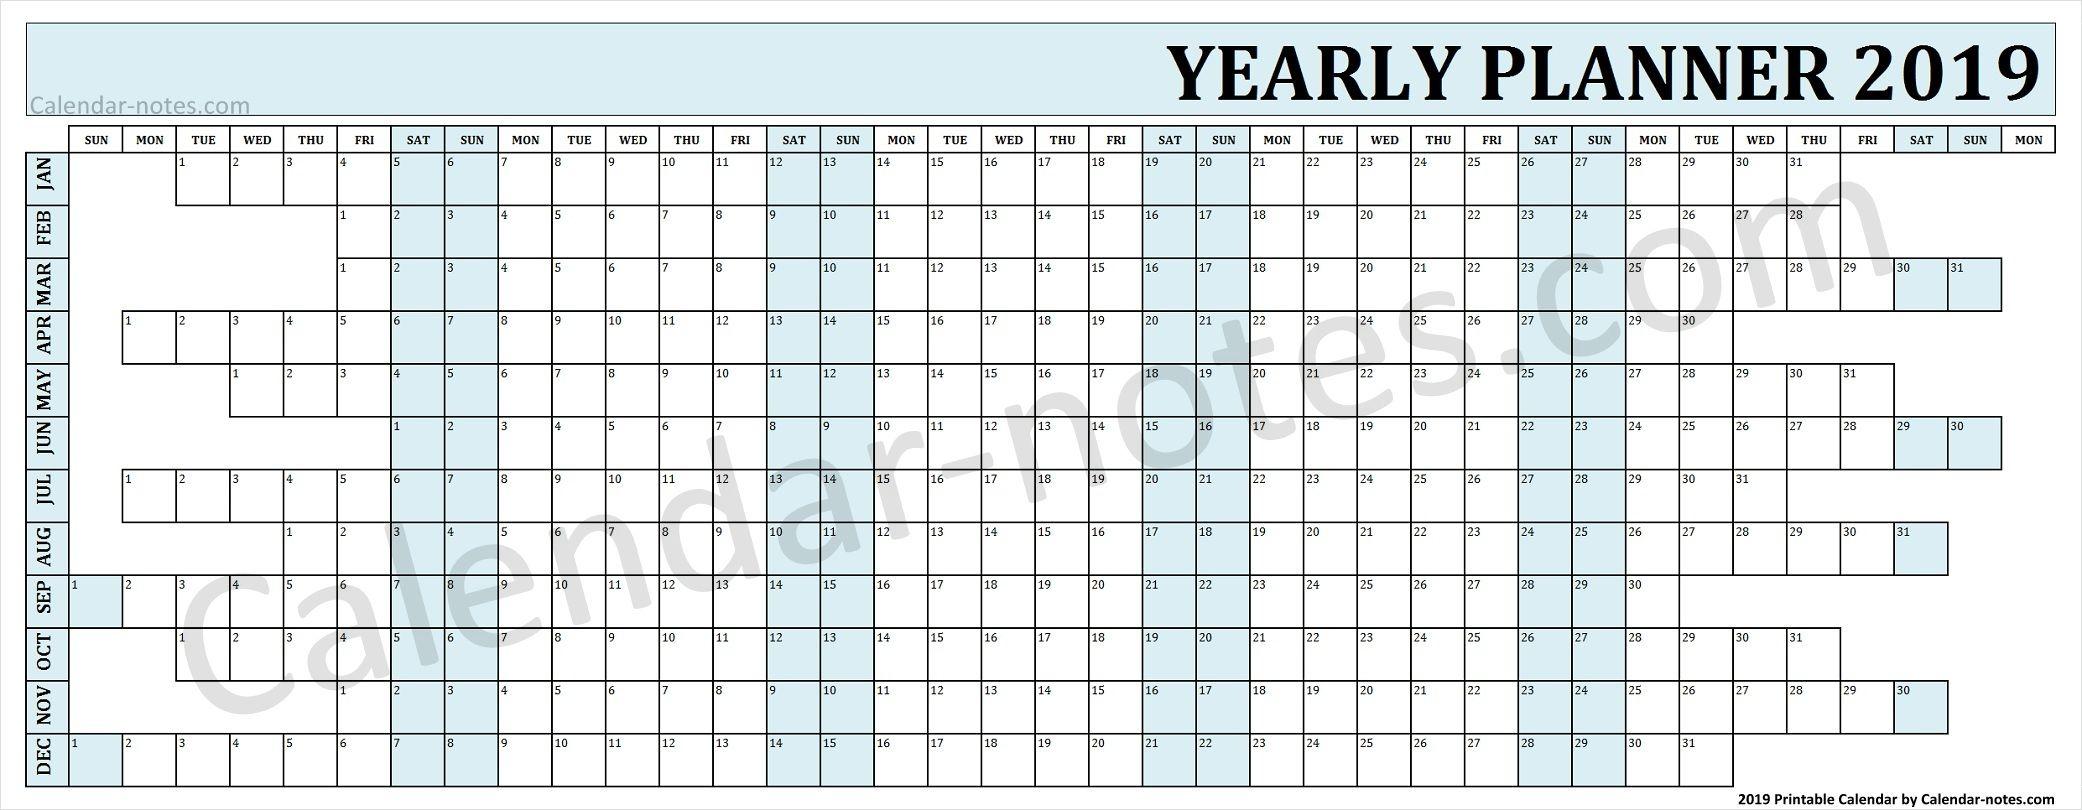 Calendar 2019 Year Planner Yearly Planner Planner Calendar